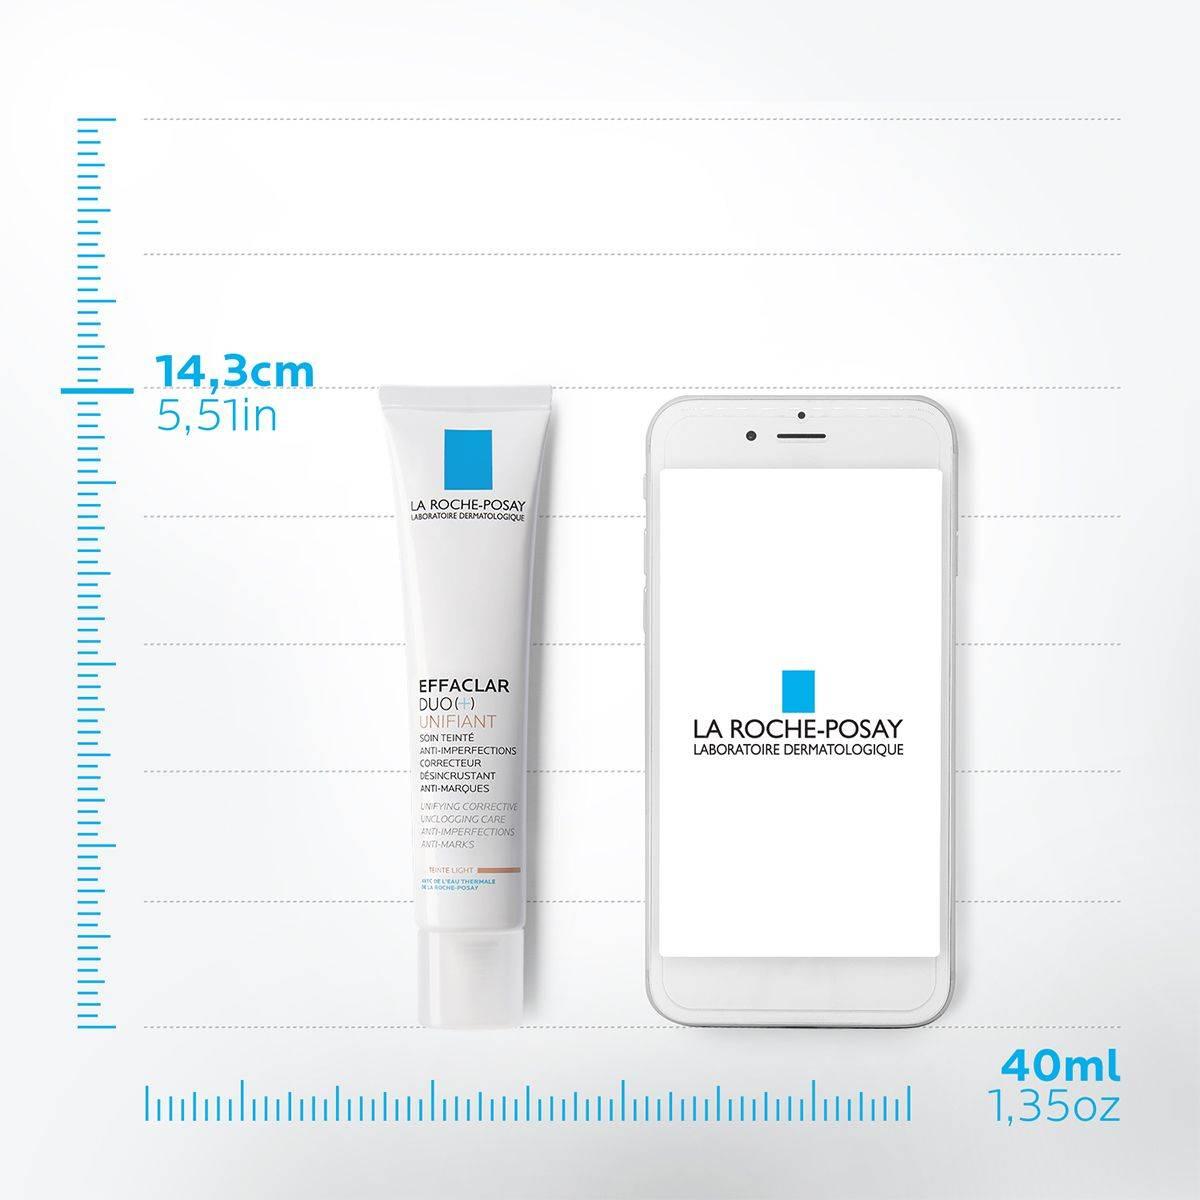 La Roche Posay Ansiktsvård Effaclar Duo plus Unifiant Light 40ml 3337875